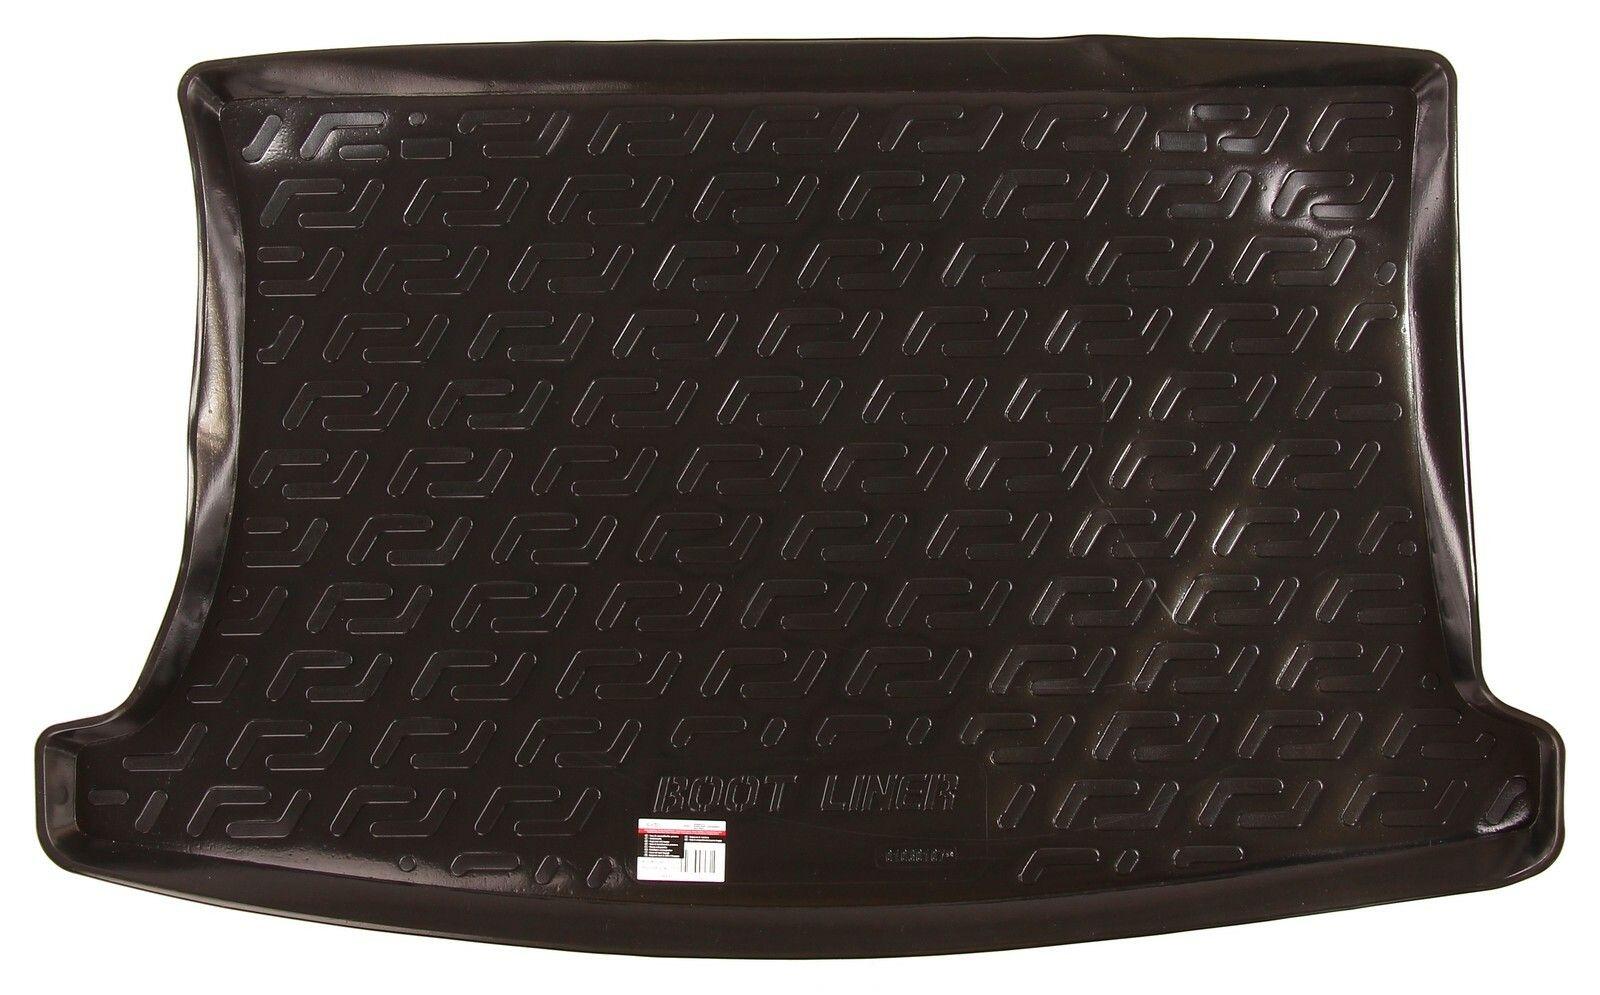 Vana do kufru plastová Kia Rio III Hatchback (UB) (11-)